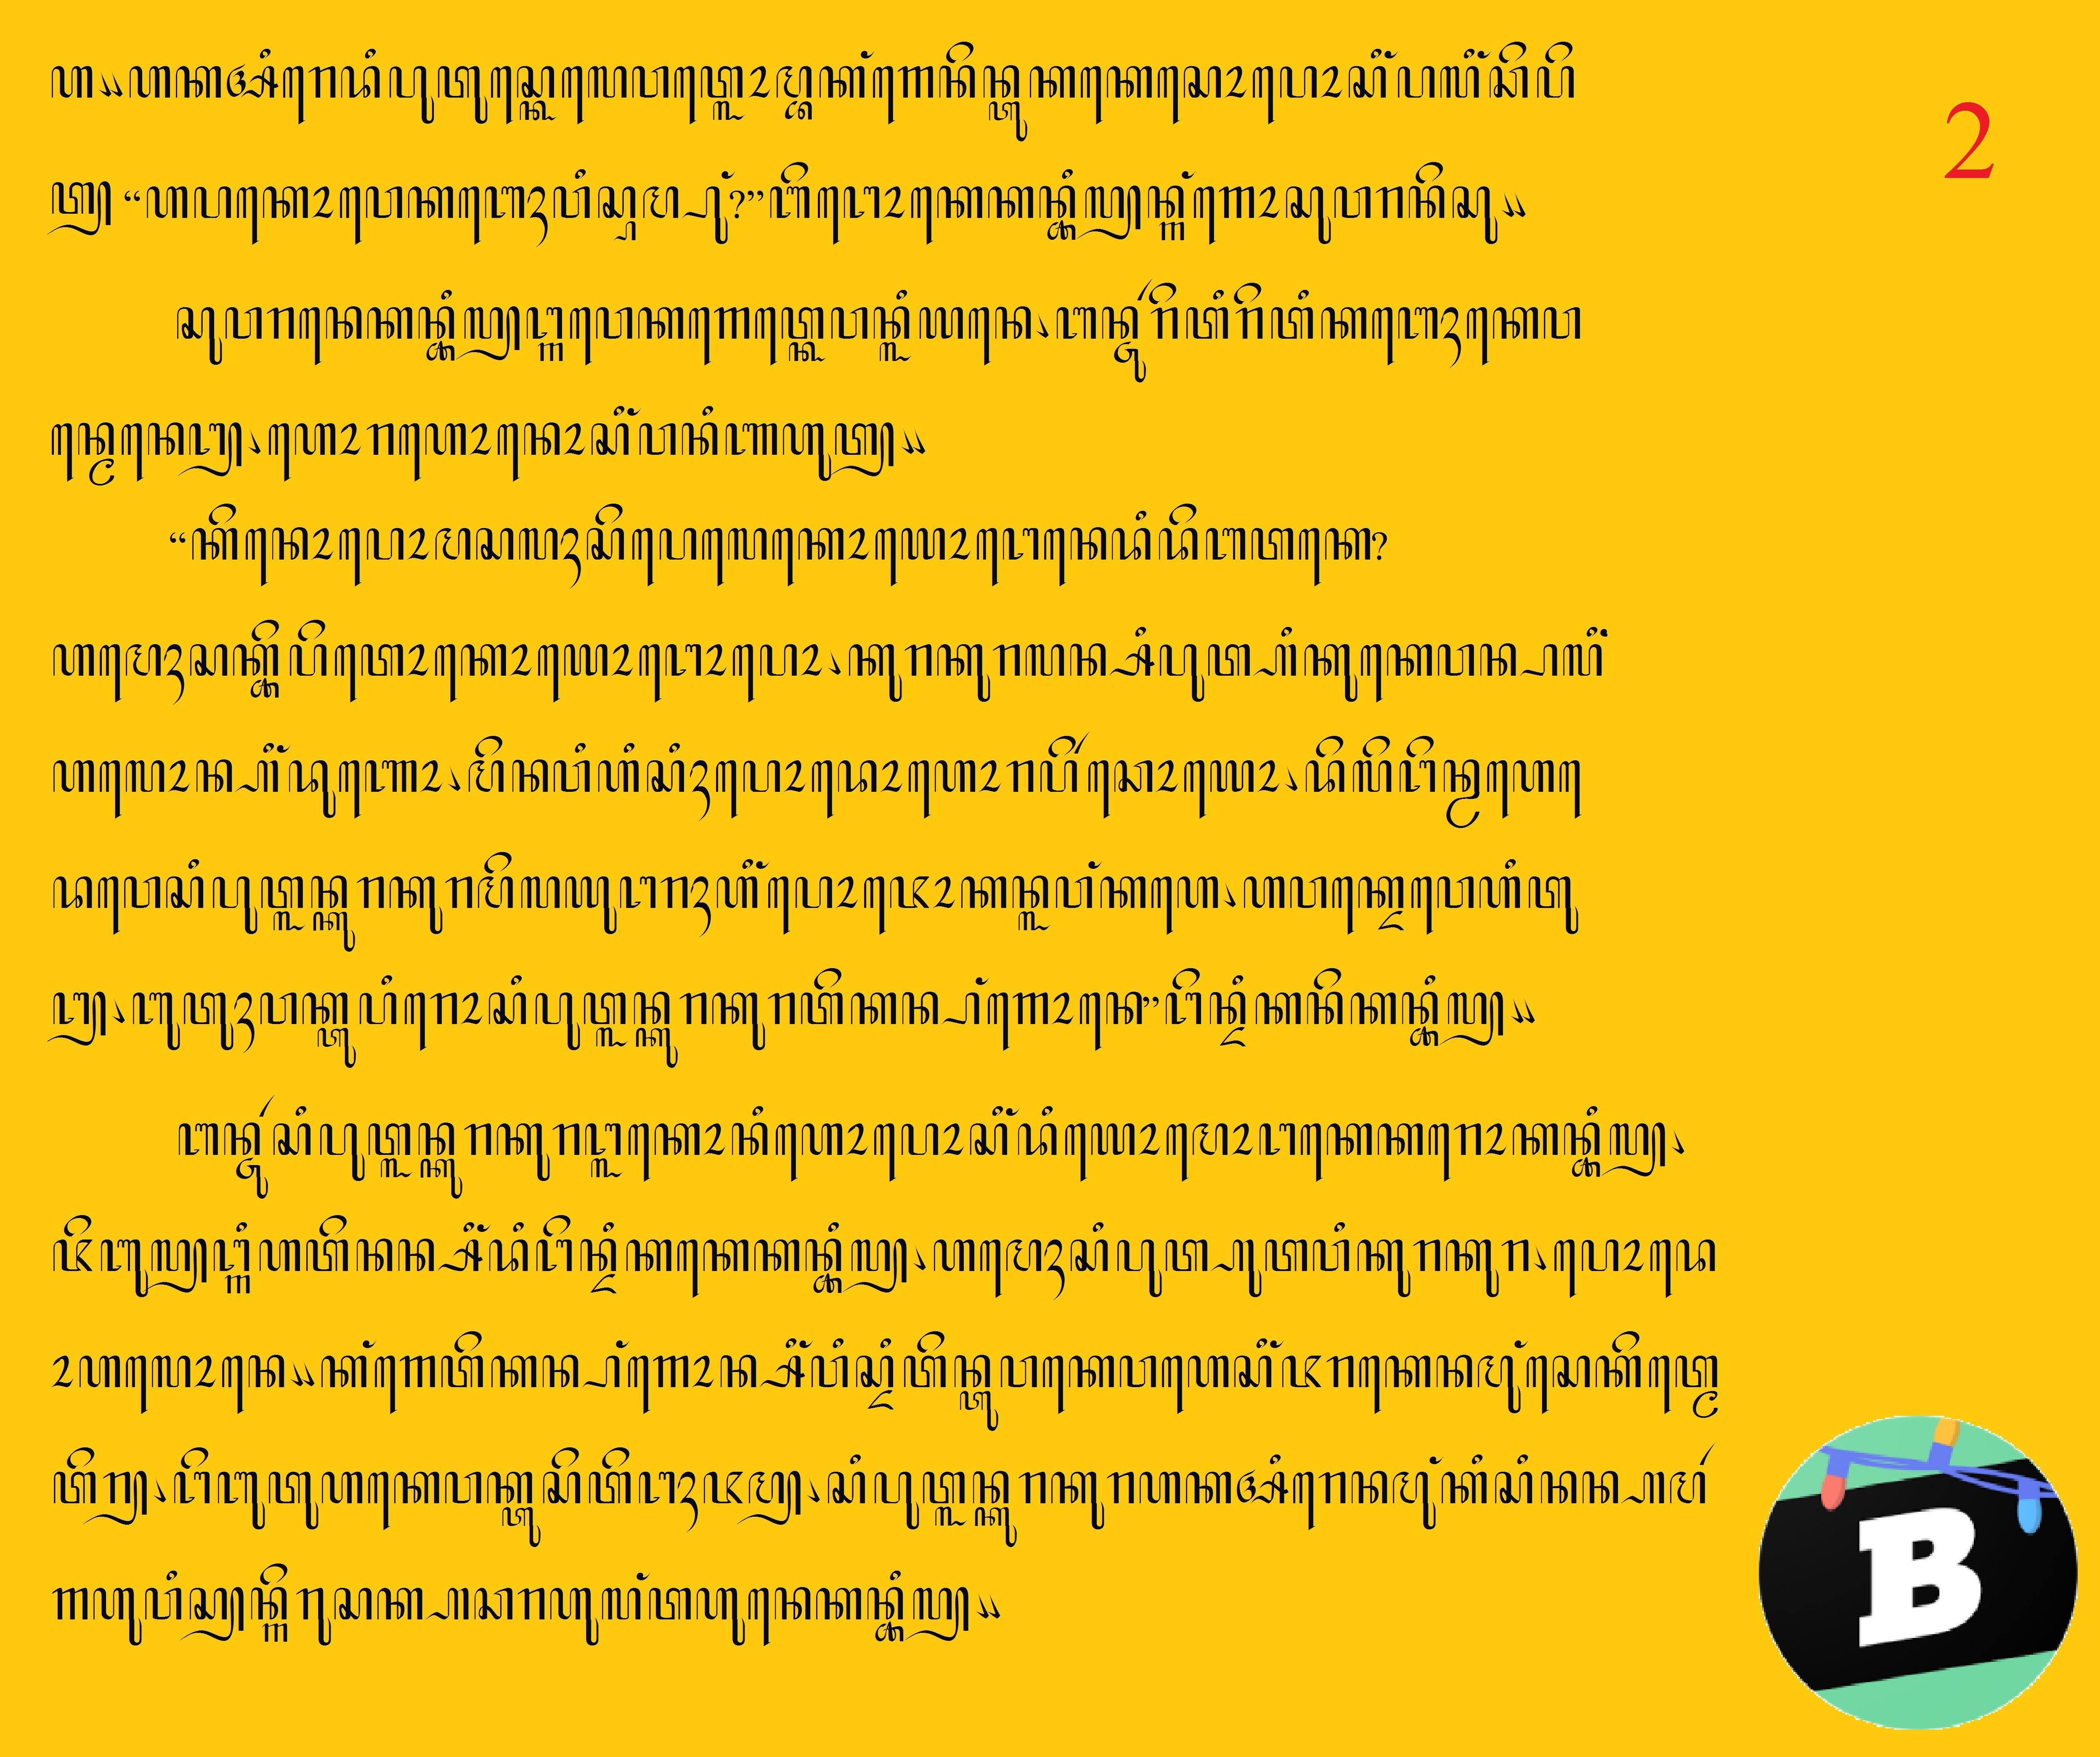 Tolong Buatin Cerpen Aksara Jawa Beserta Artinya Brainly Co Id